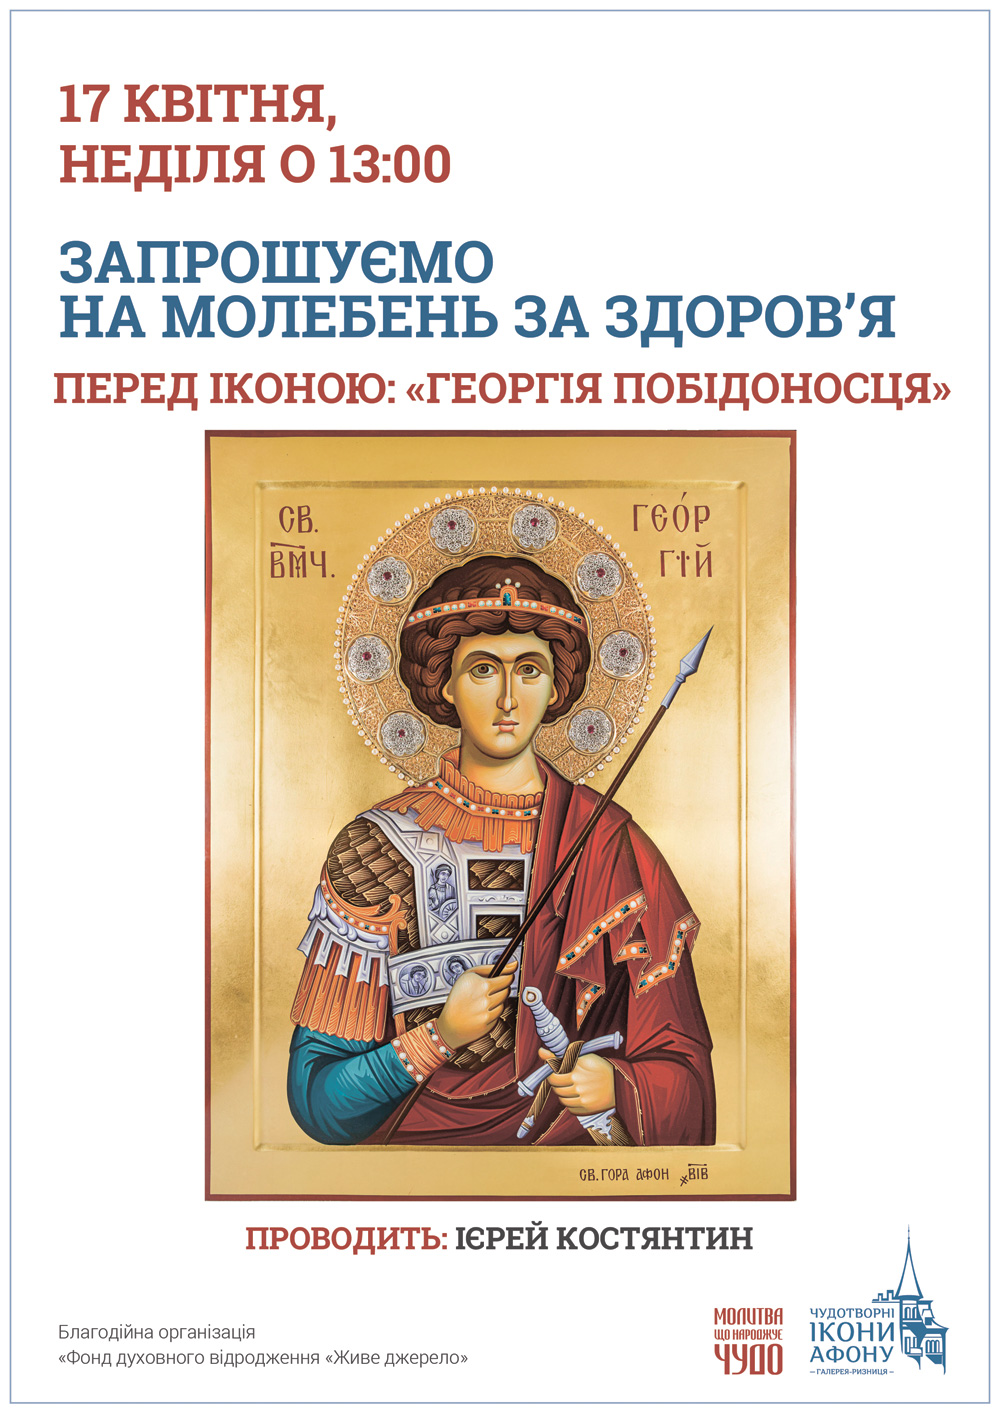 Георгий победоносец молитва о здравии